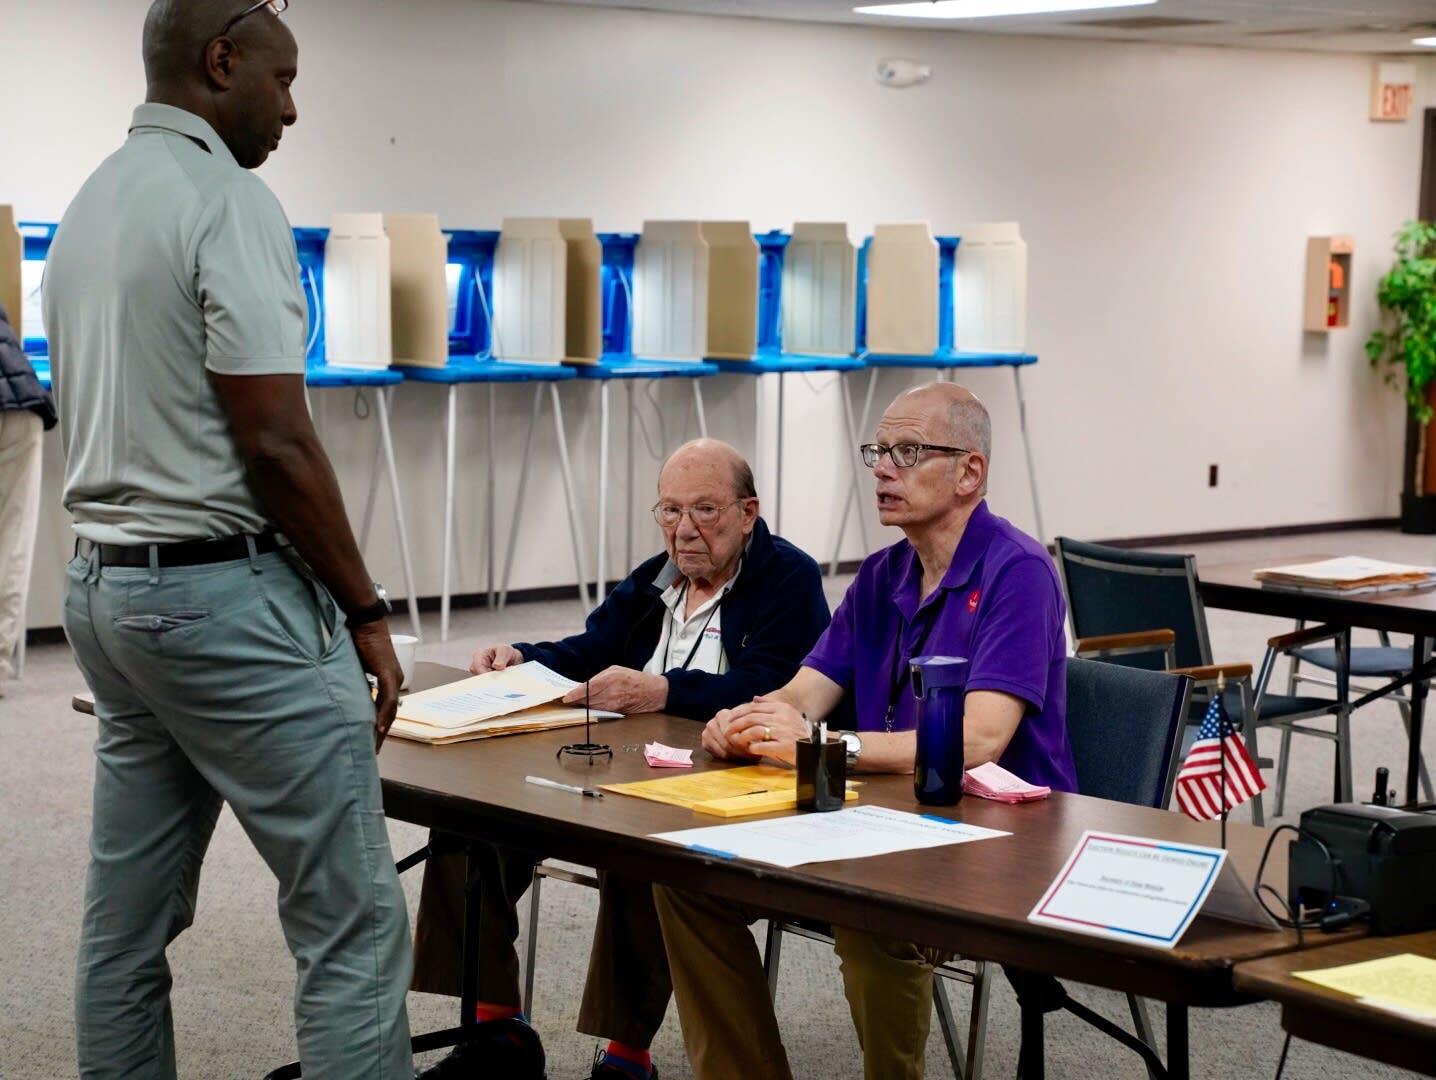 Judges Roger Guarino, right, and Richard Hall greet Demetrius Brooks.